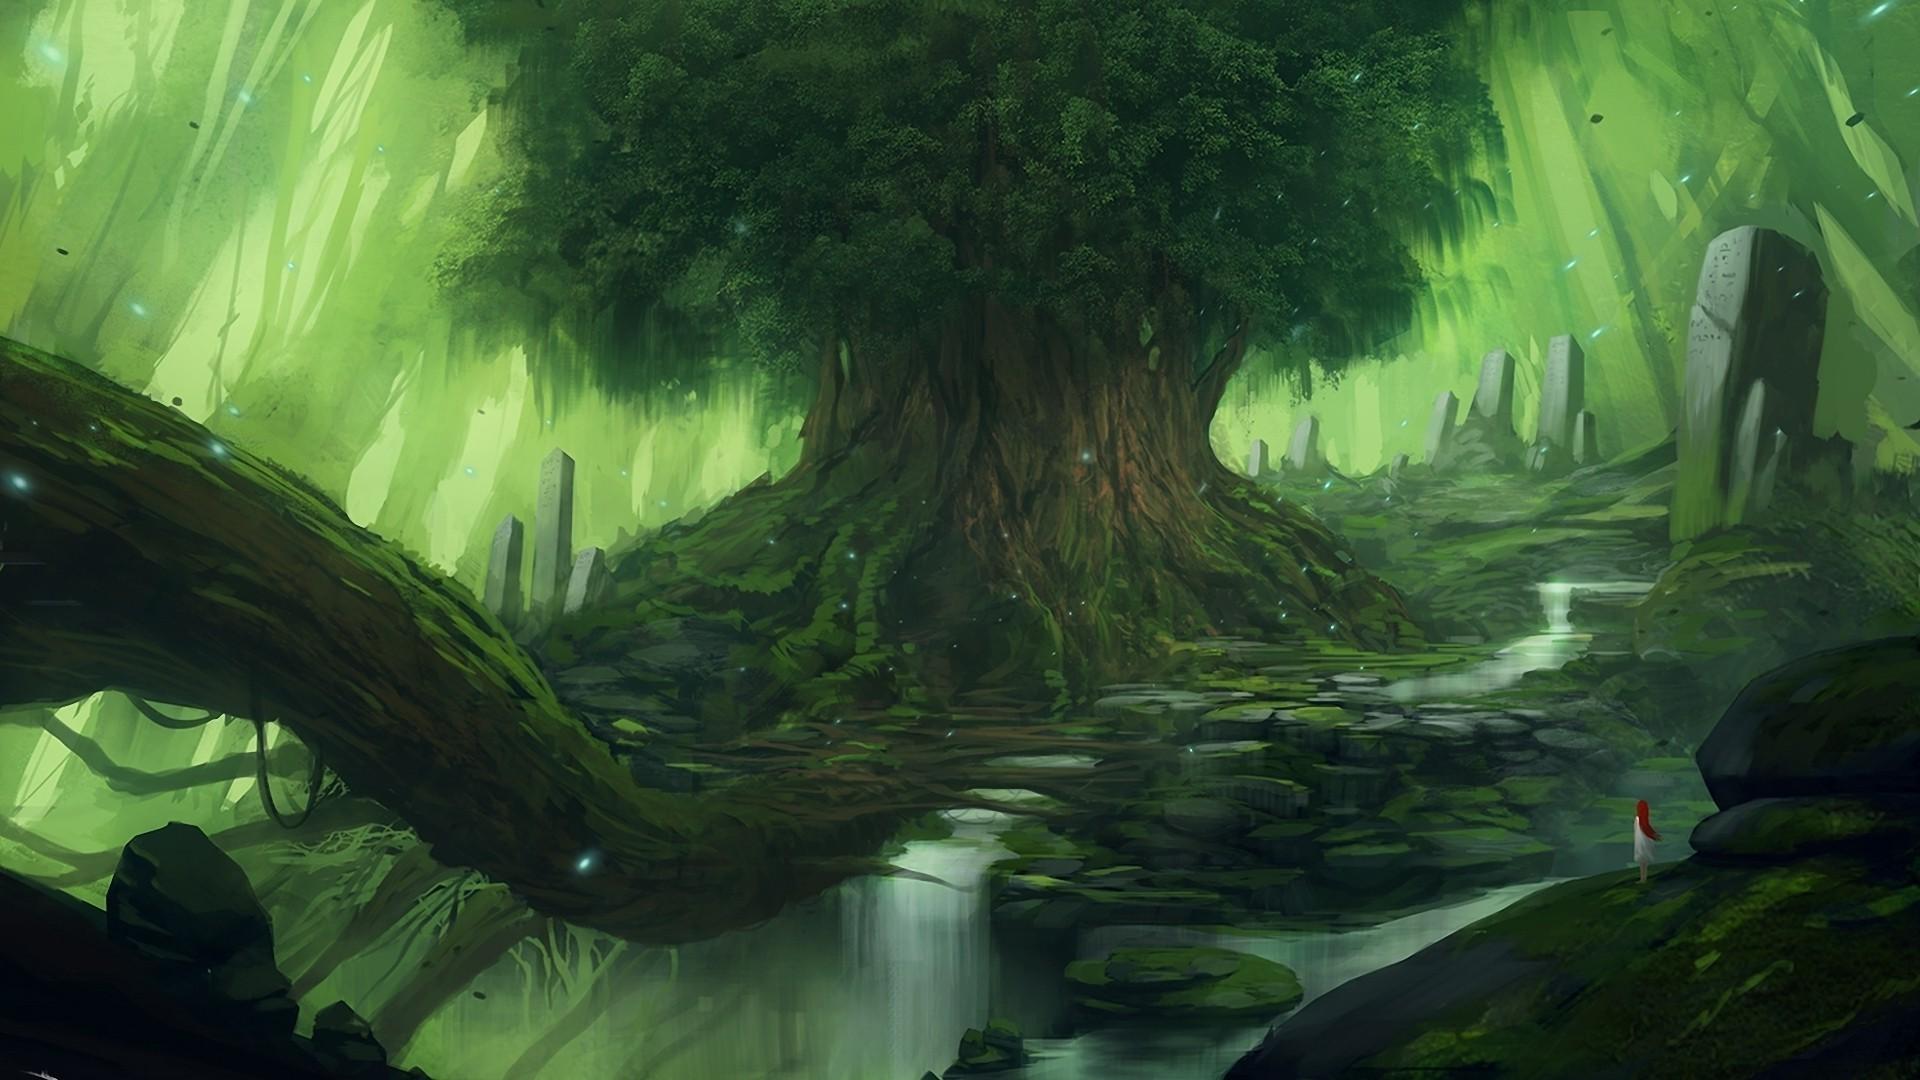 Fantasy Forest Wallpaper (1)